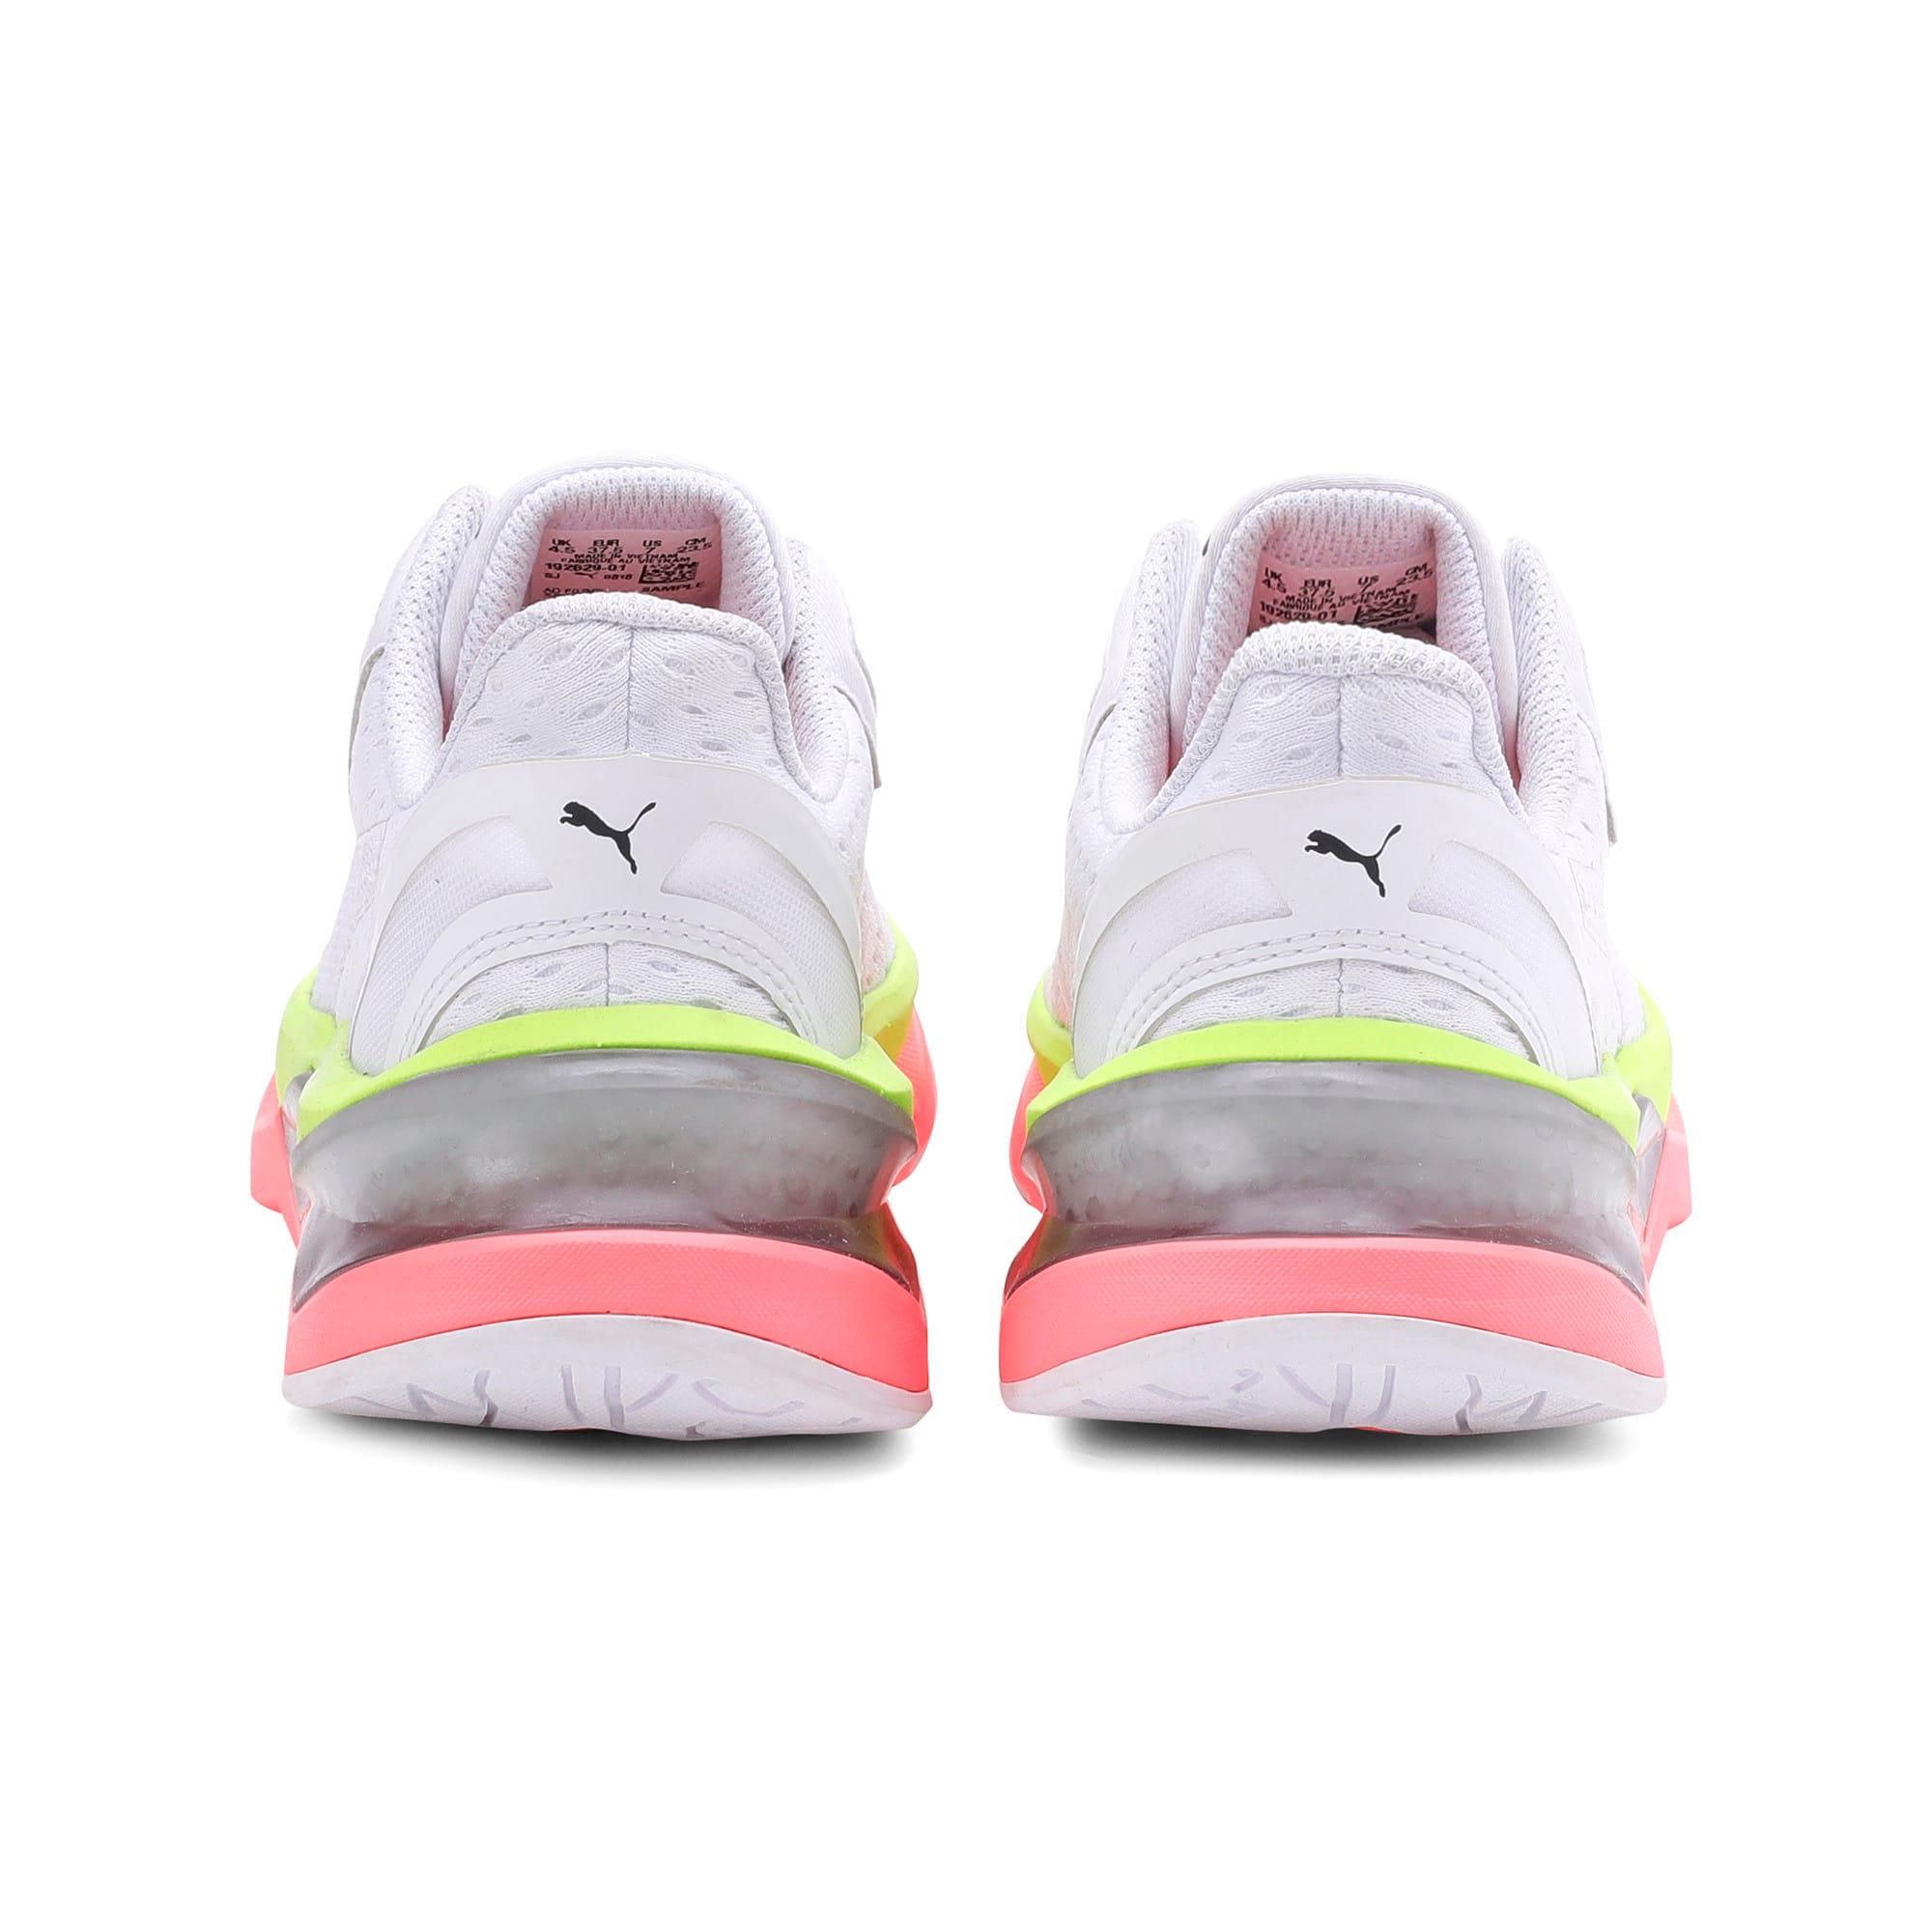 Thumbnail 5 of LQDCell Shatter XT Women's Training Shoes, Puma White-Pink Alert, medium-IND